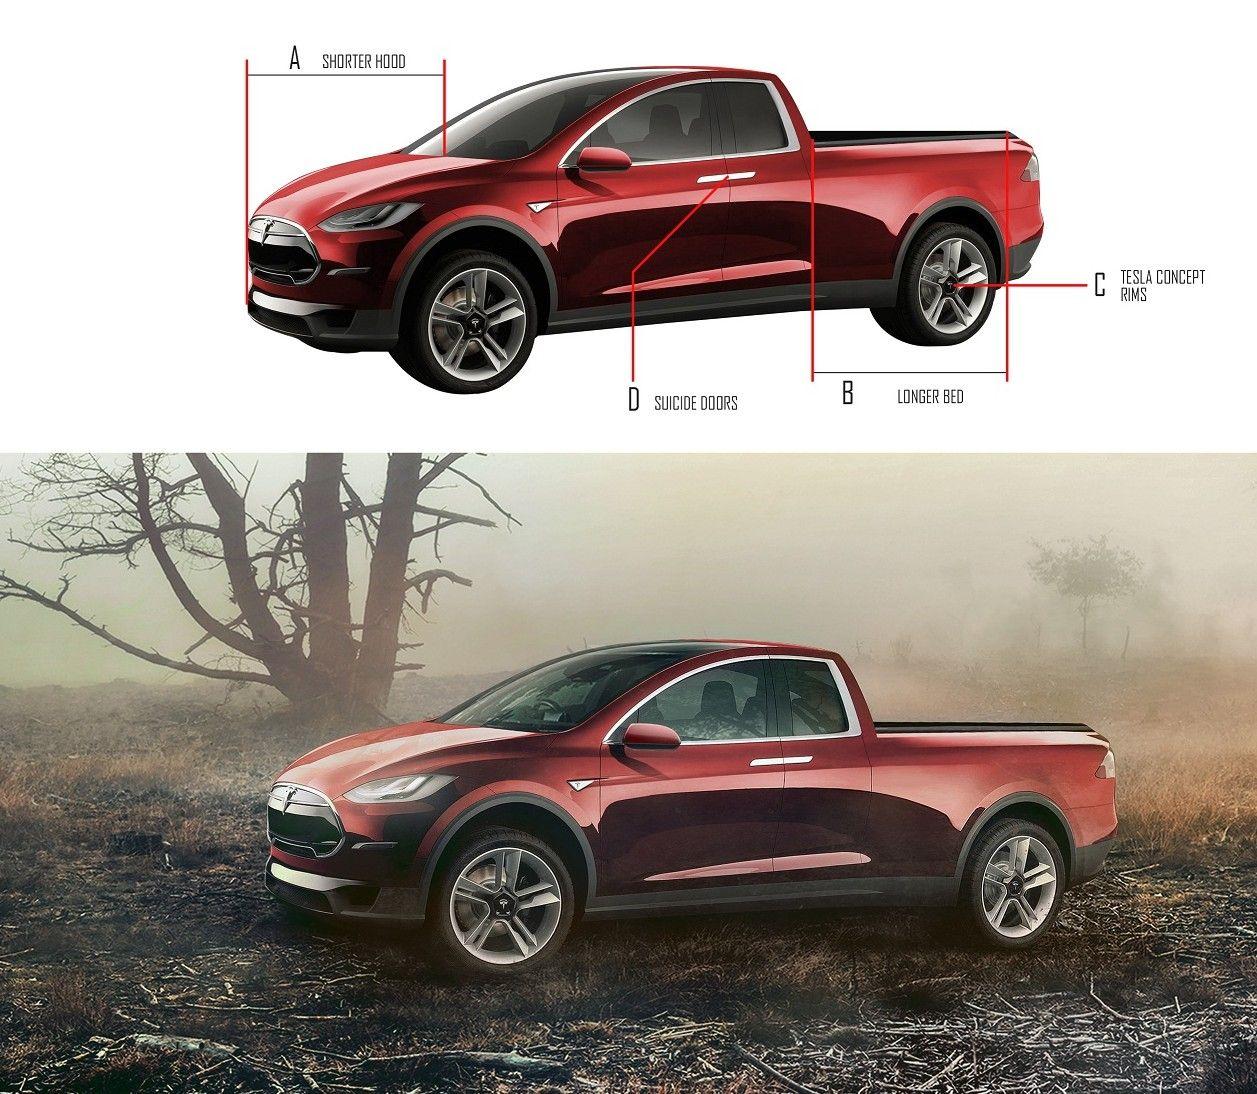 Tesla Motors Images Tesla Model S Larson Sketches: 2017 Tesla Pickup Truck Price Concept, Release Date, Price